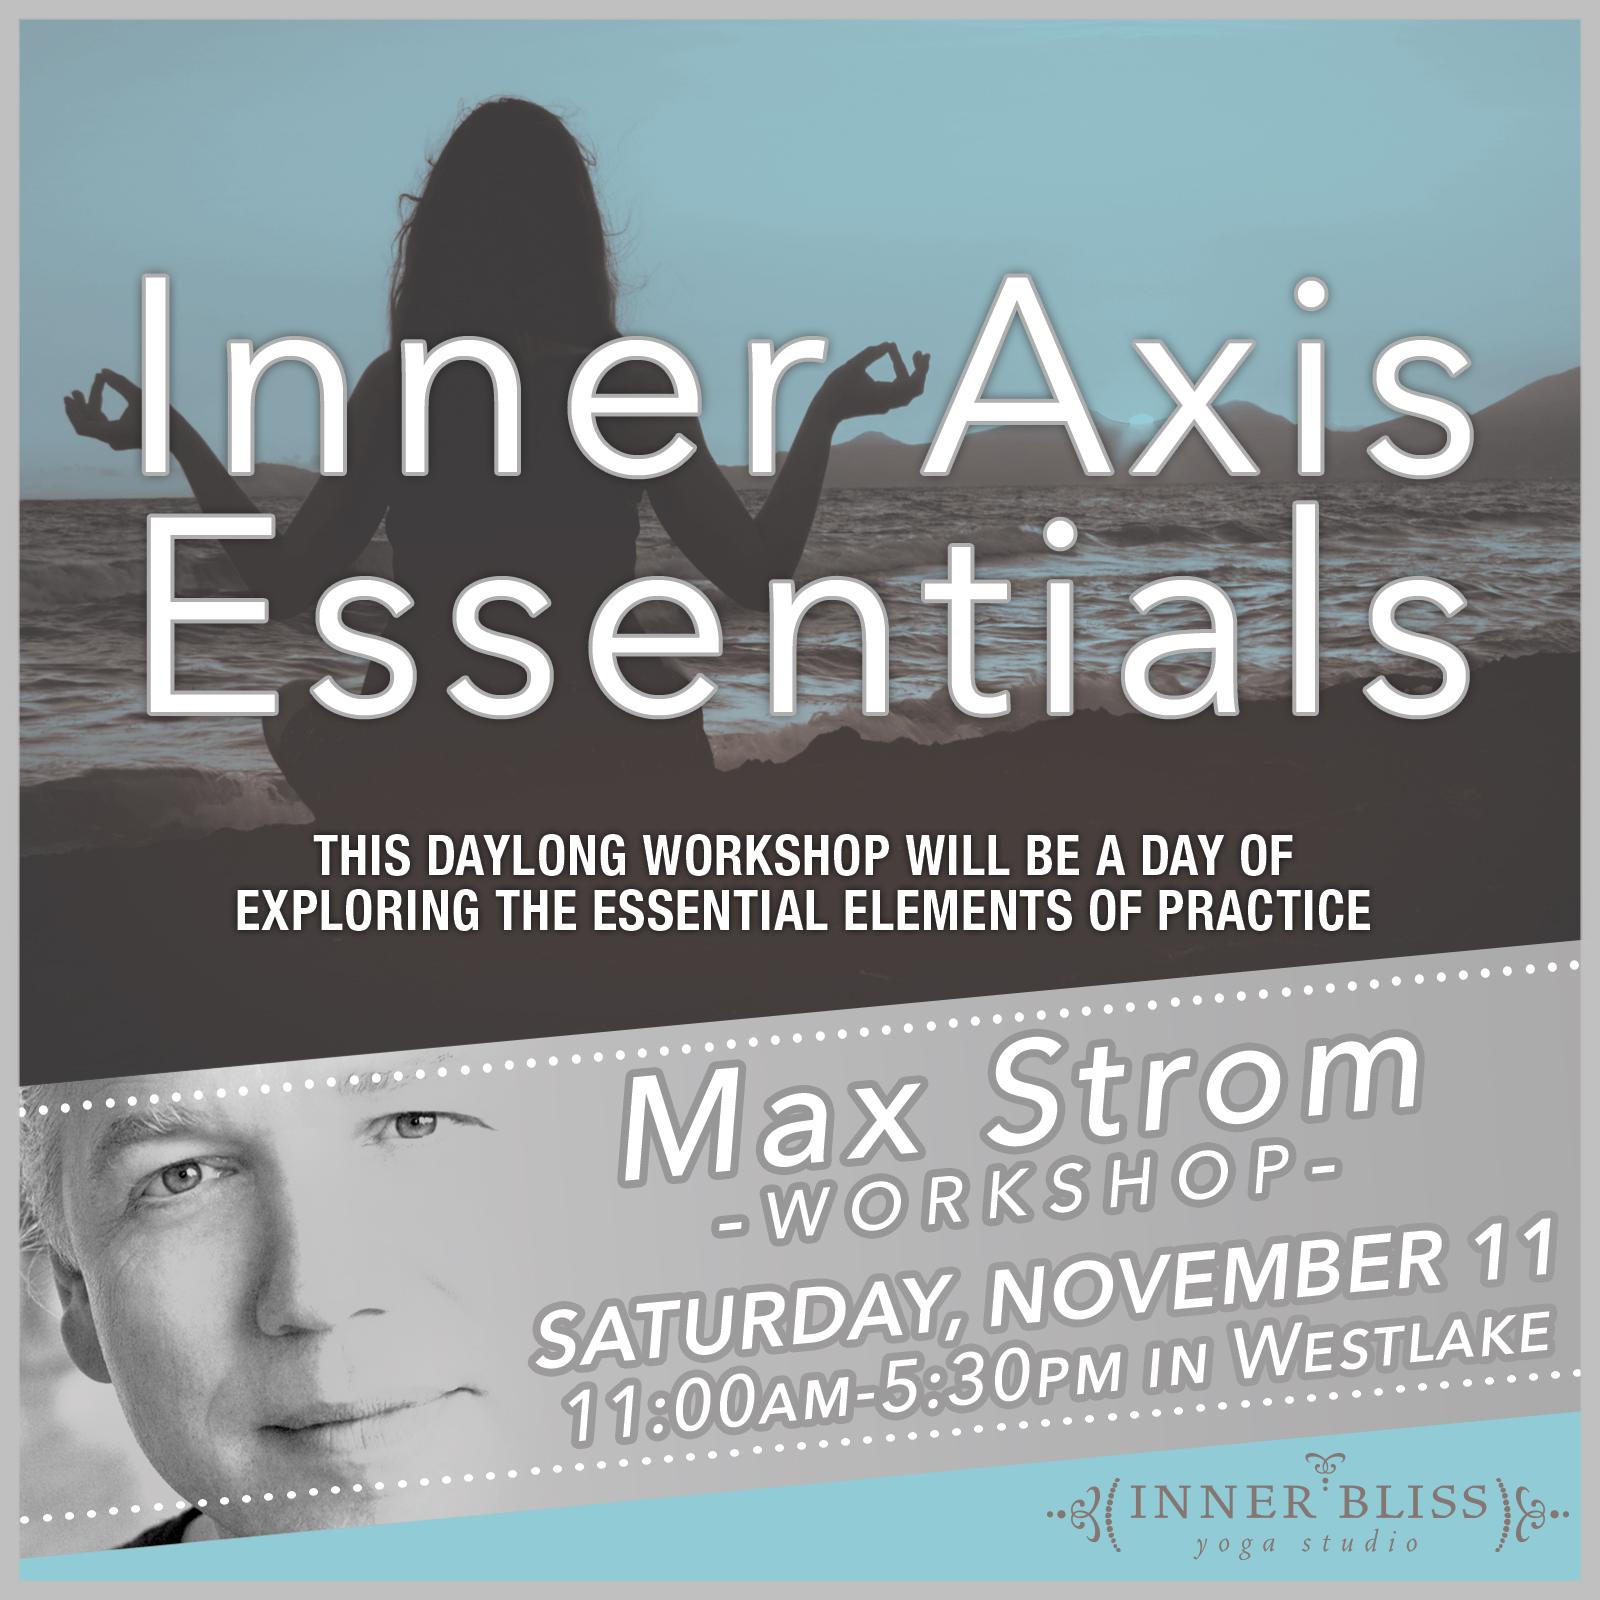 iby-max-strom-inner-axis.jpg